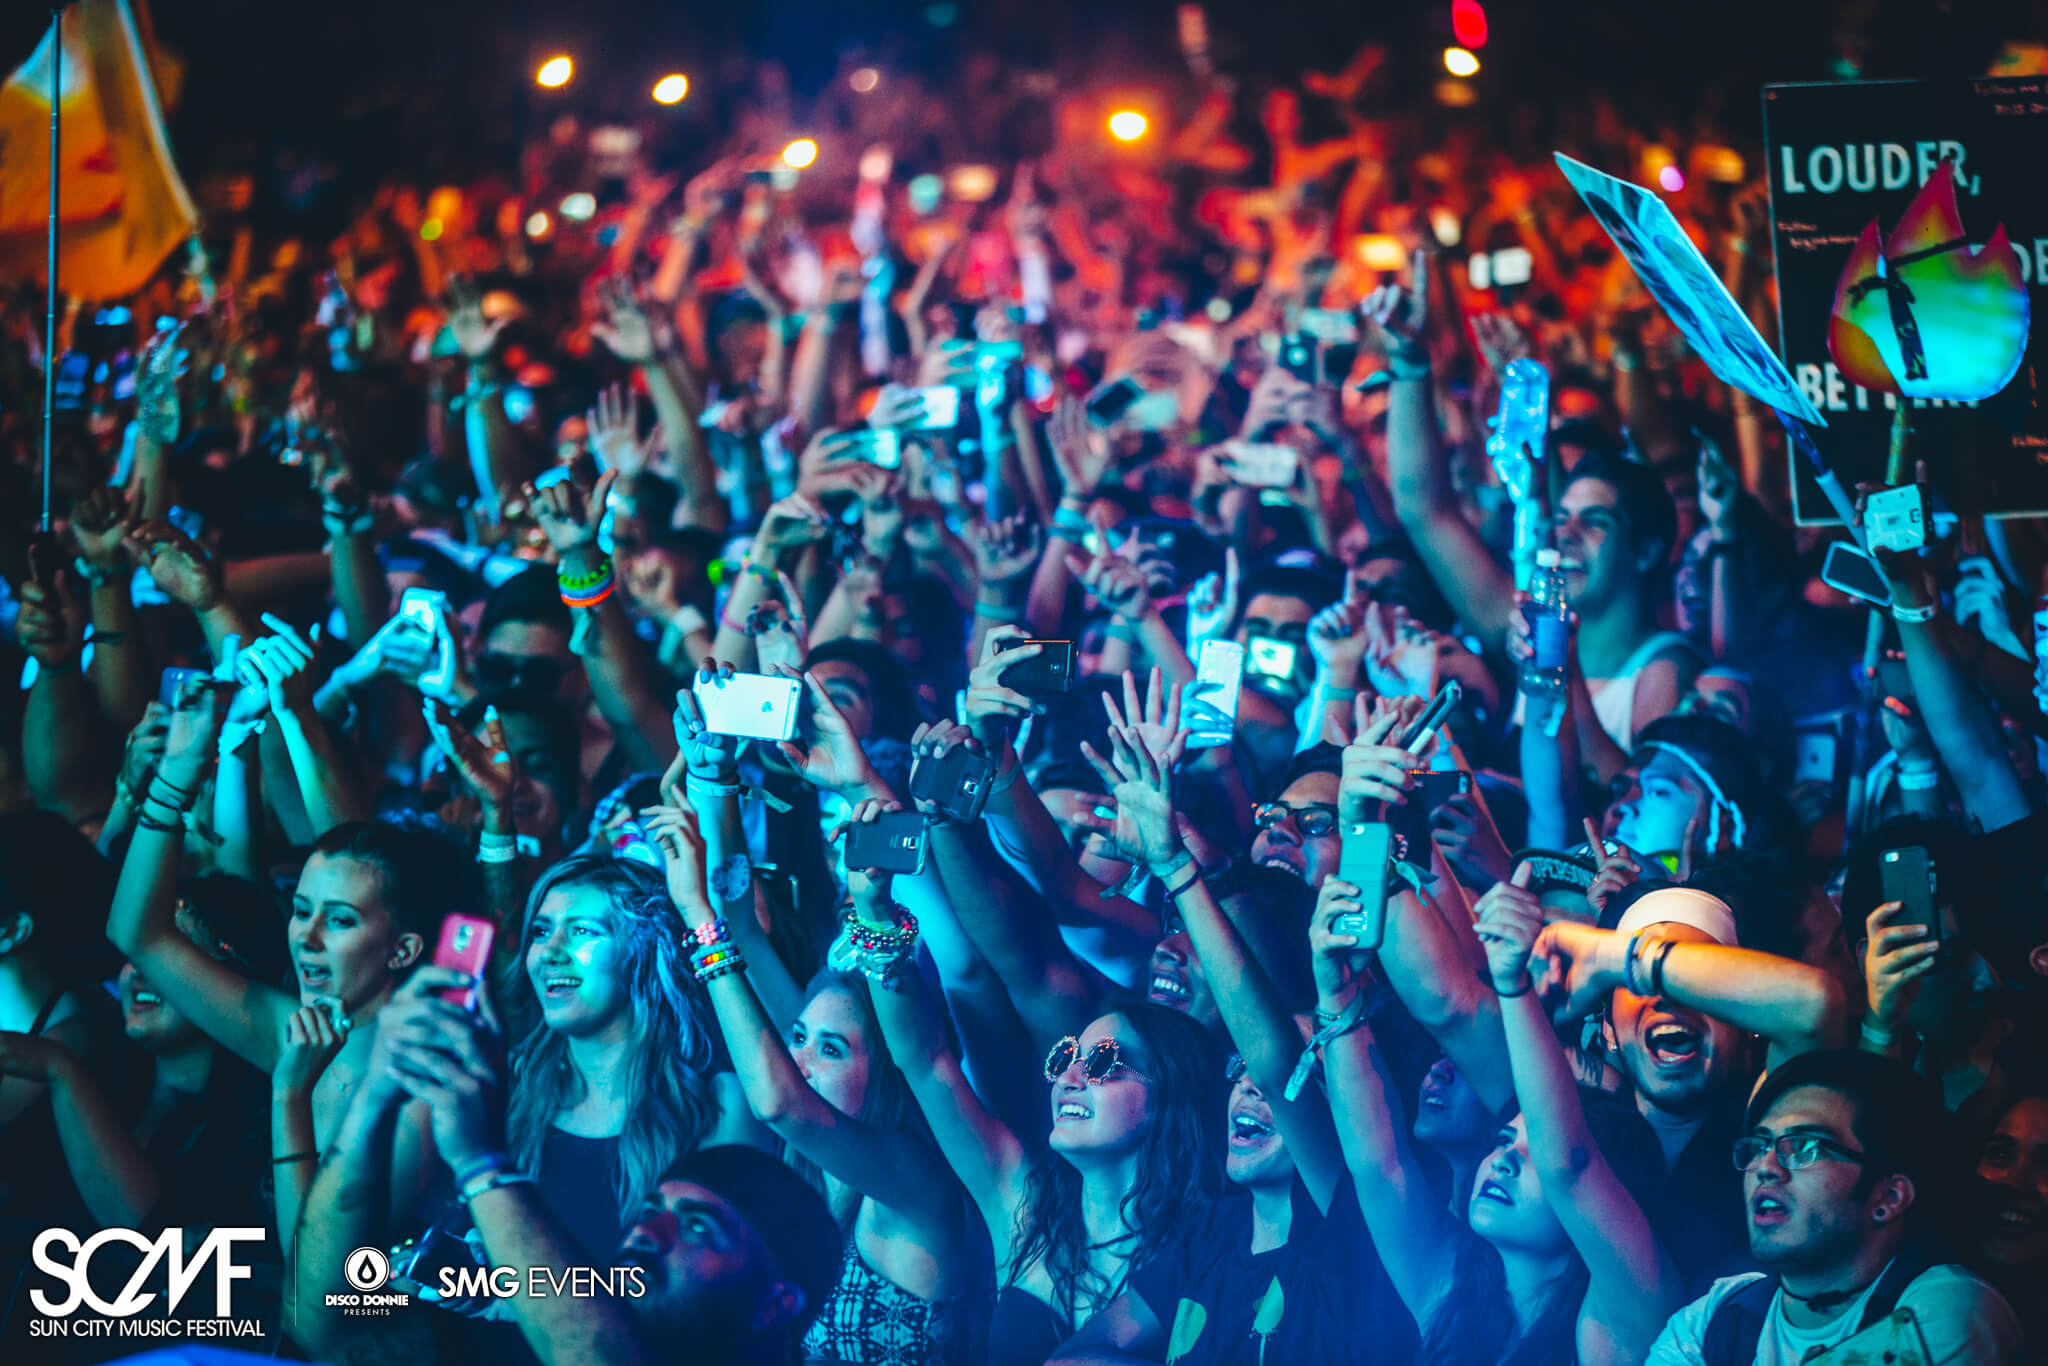 galantis fans with phones front row sun city music festival